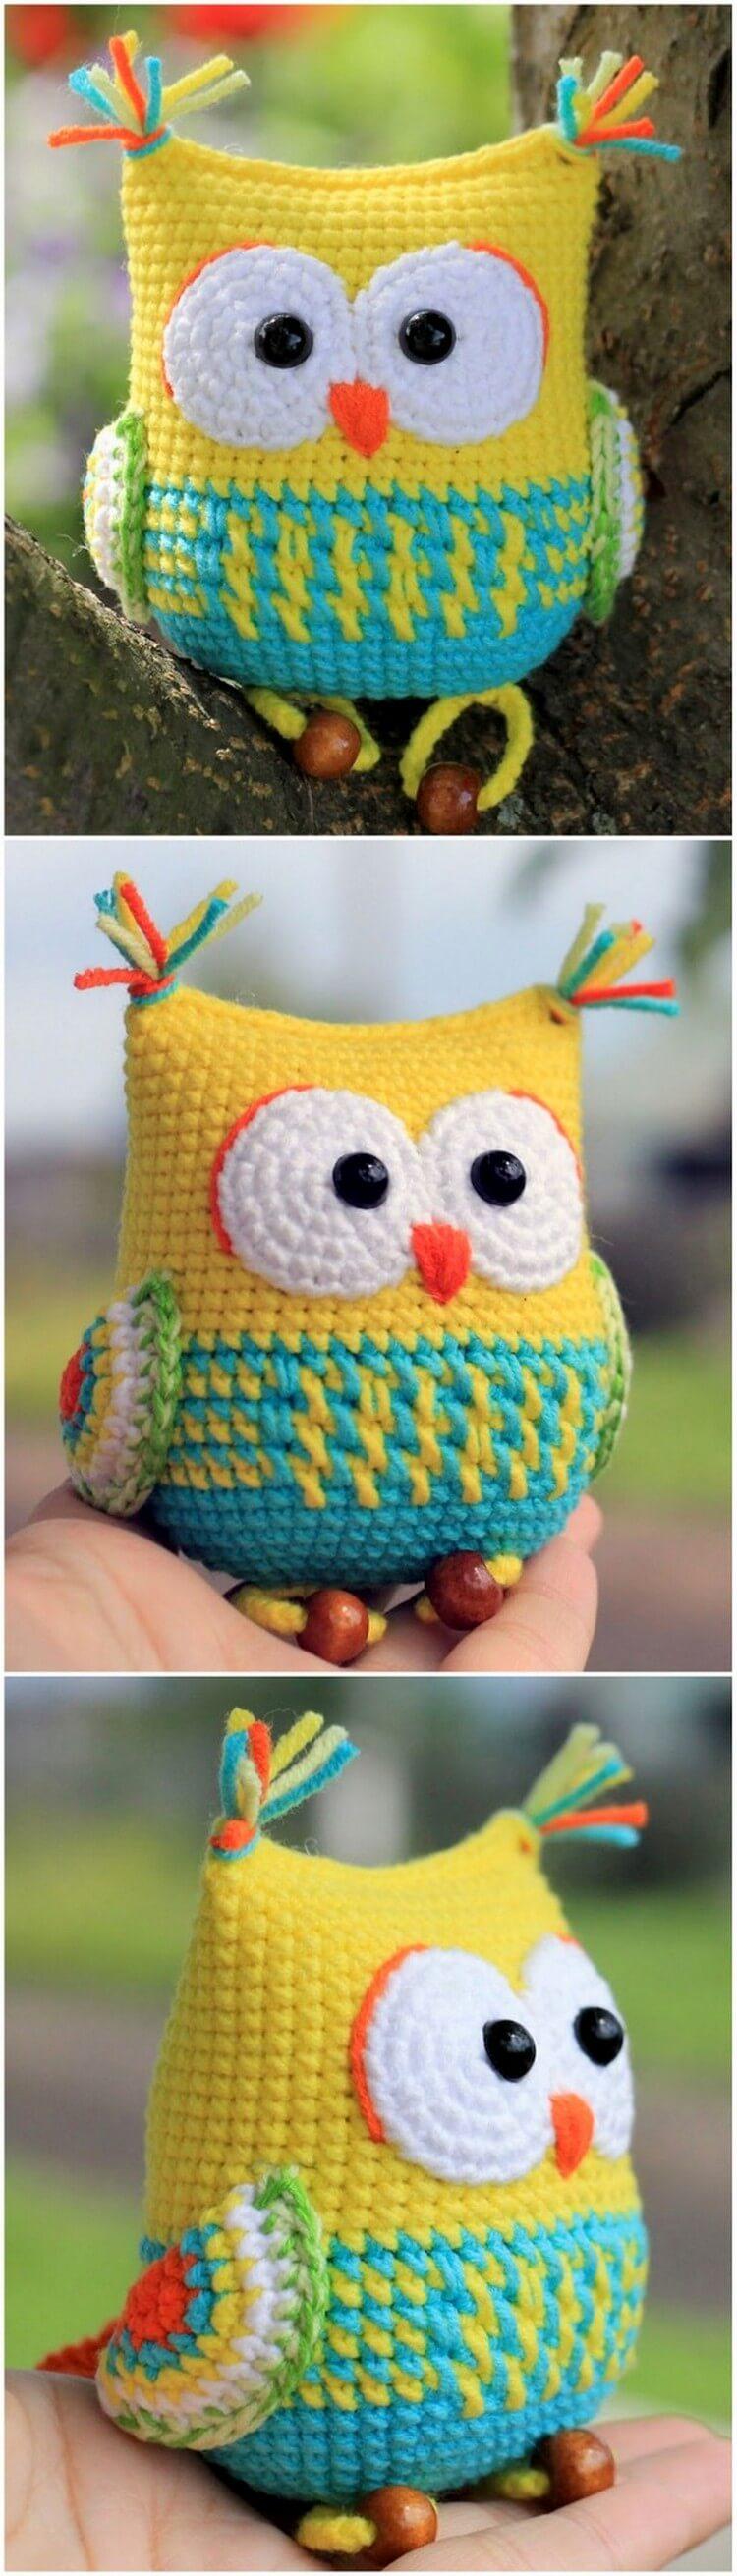 Crochet Amigurumi Pattern (81)